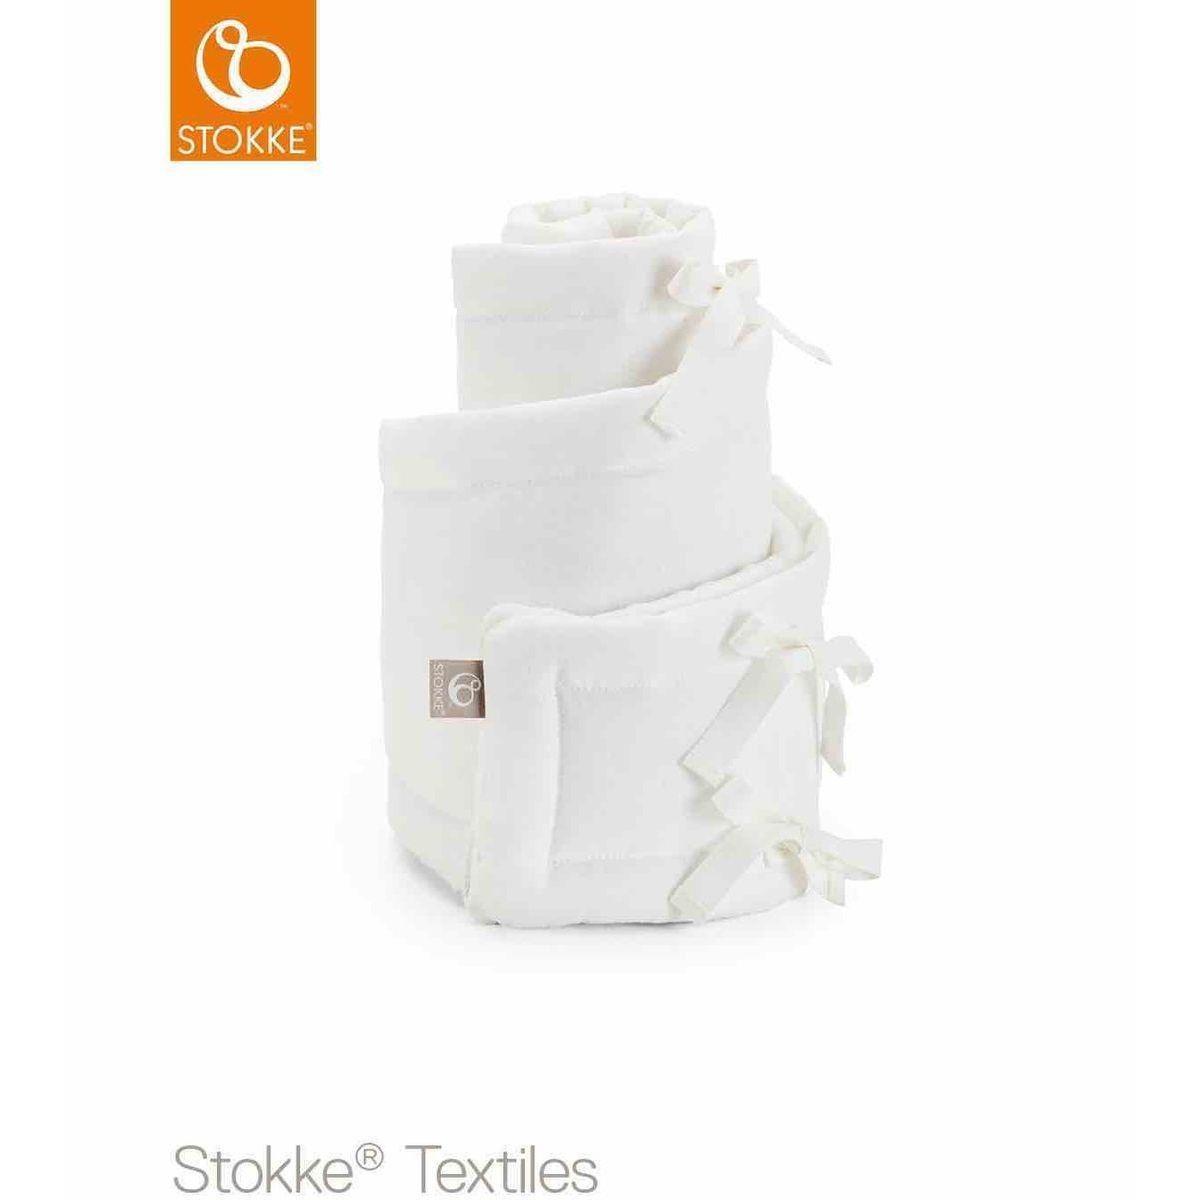 Protector cuna-cama universal SLEEPI Stokke blanco